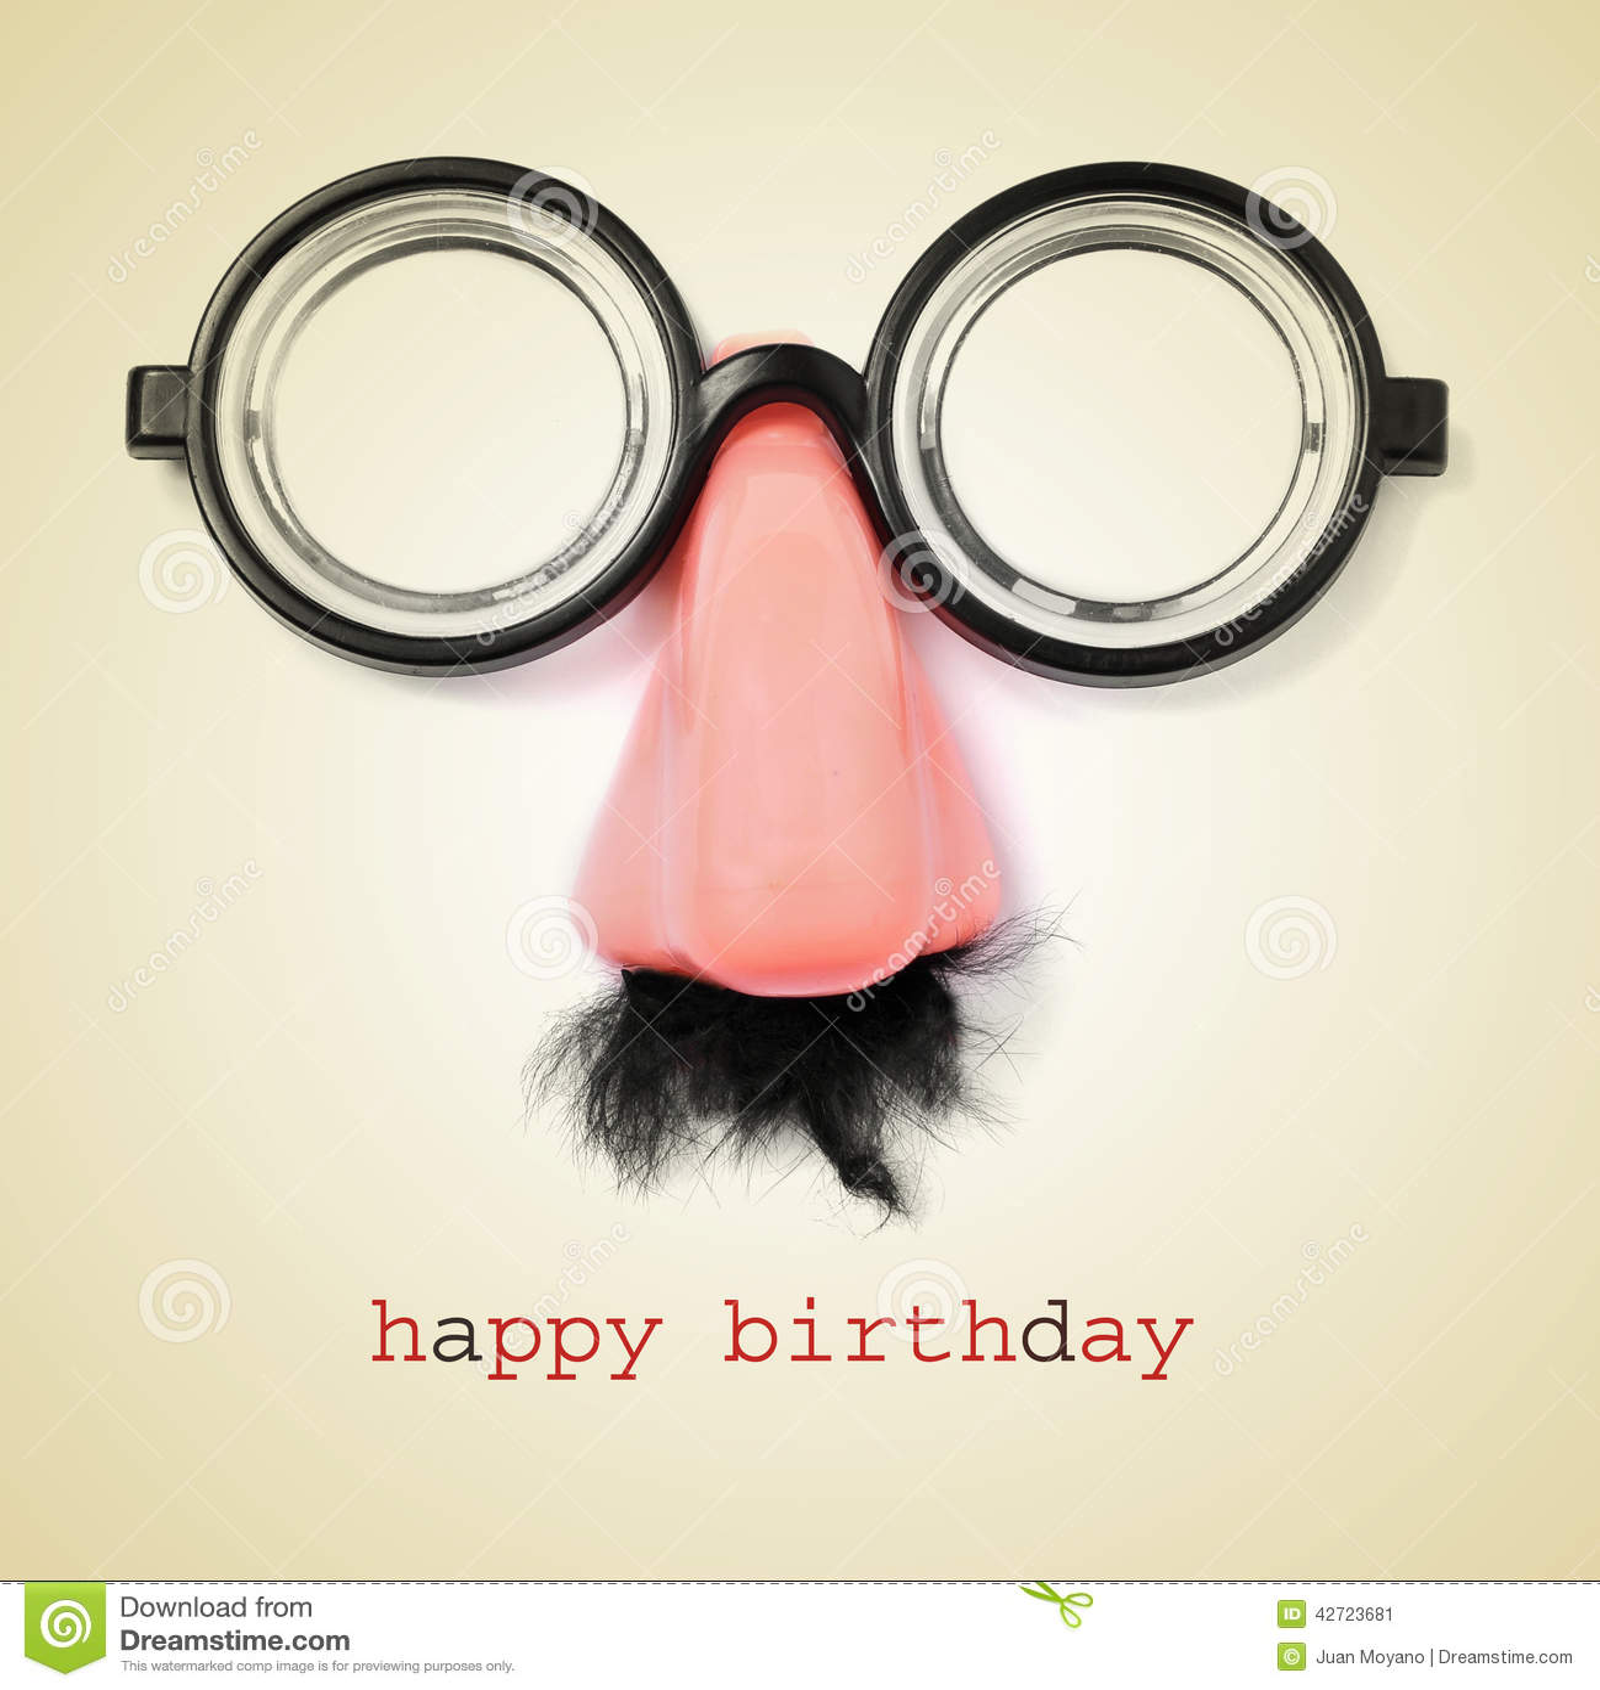 Retro happy birthday vector happy birthday vintage card with - Happy Birthday Stock Photo Image 42723681